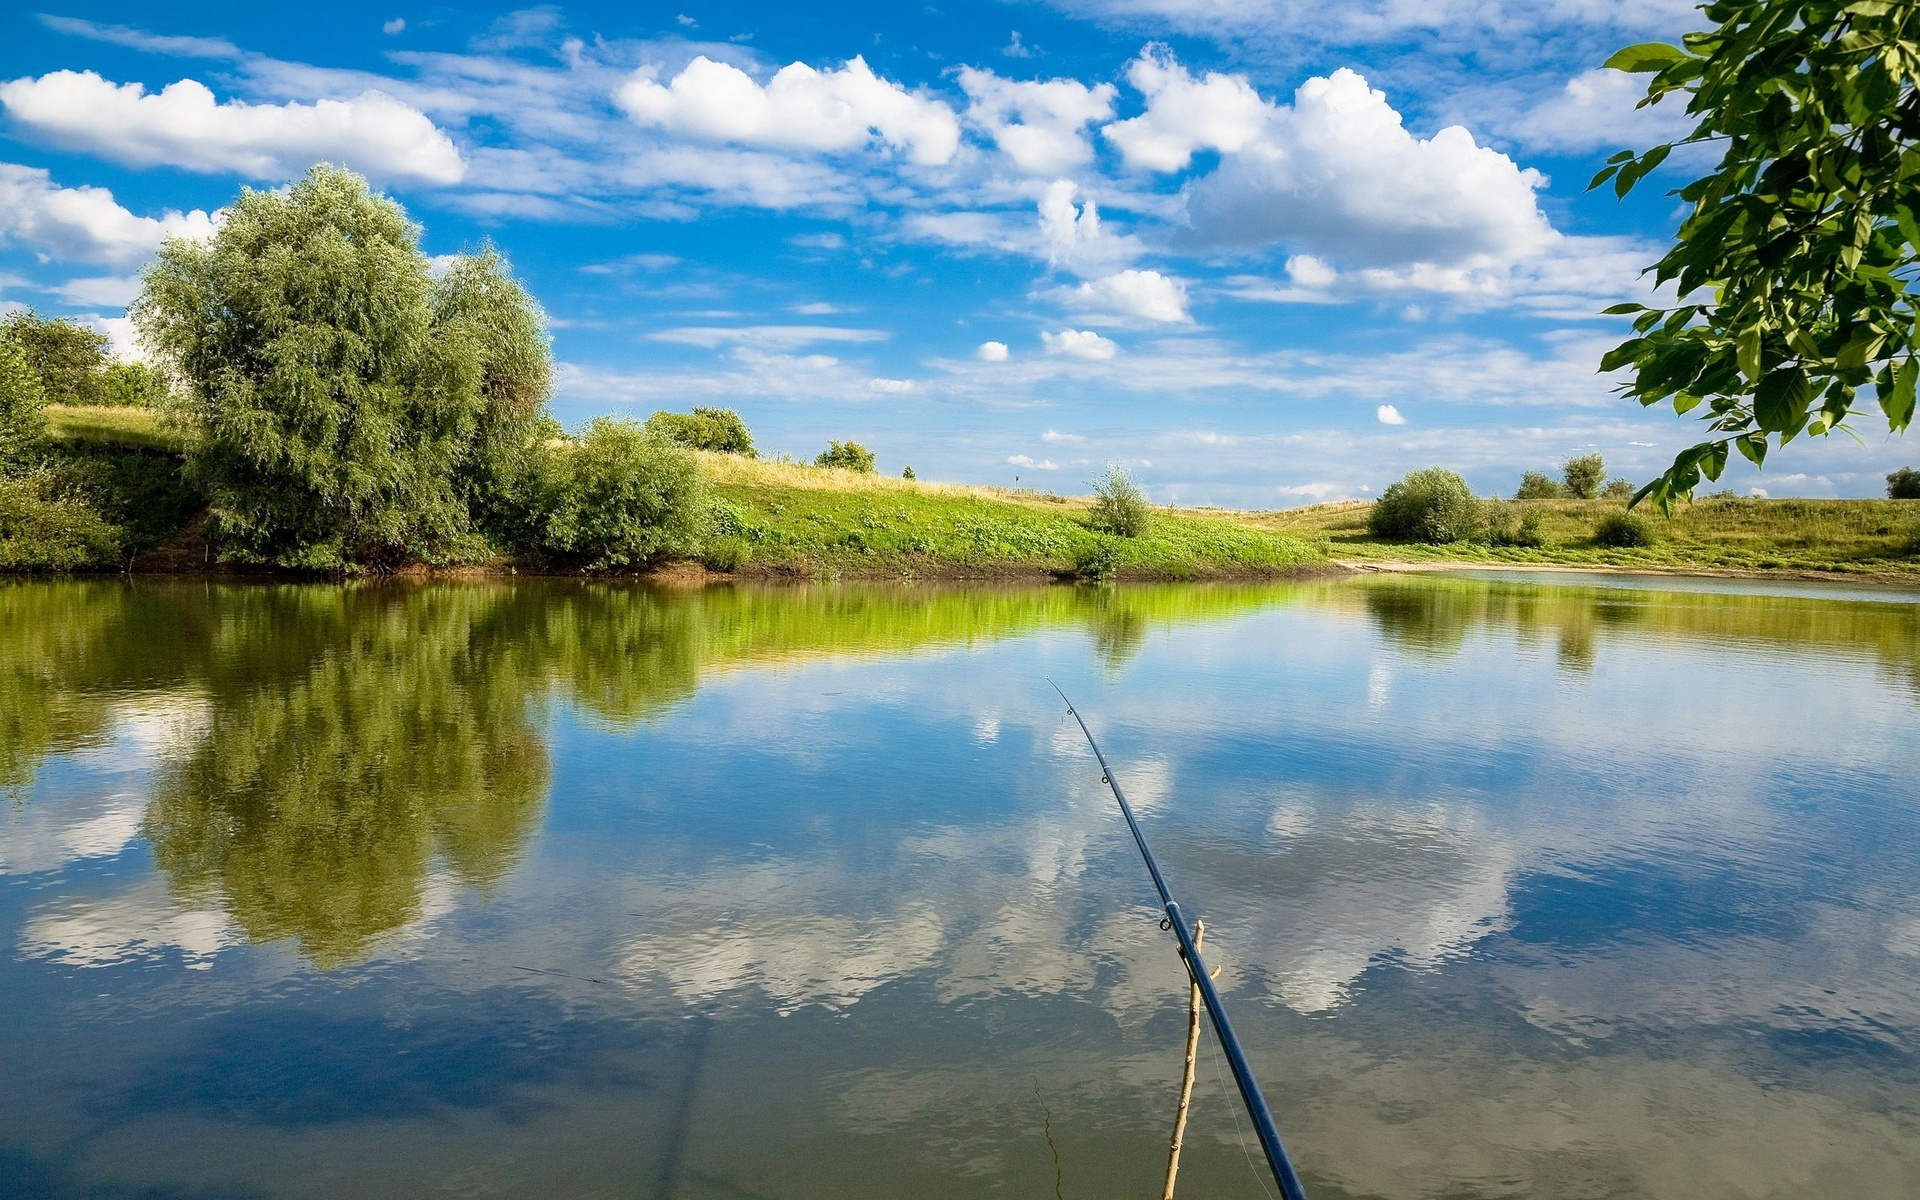 Fishing Background Wallpaper 1920x1200